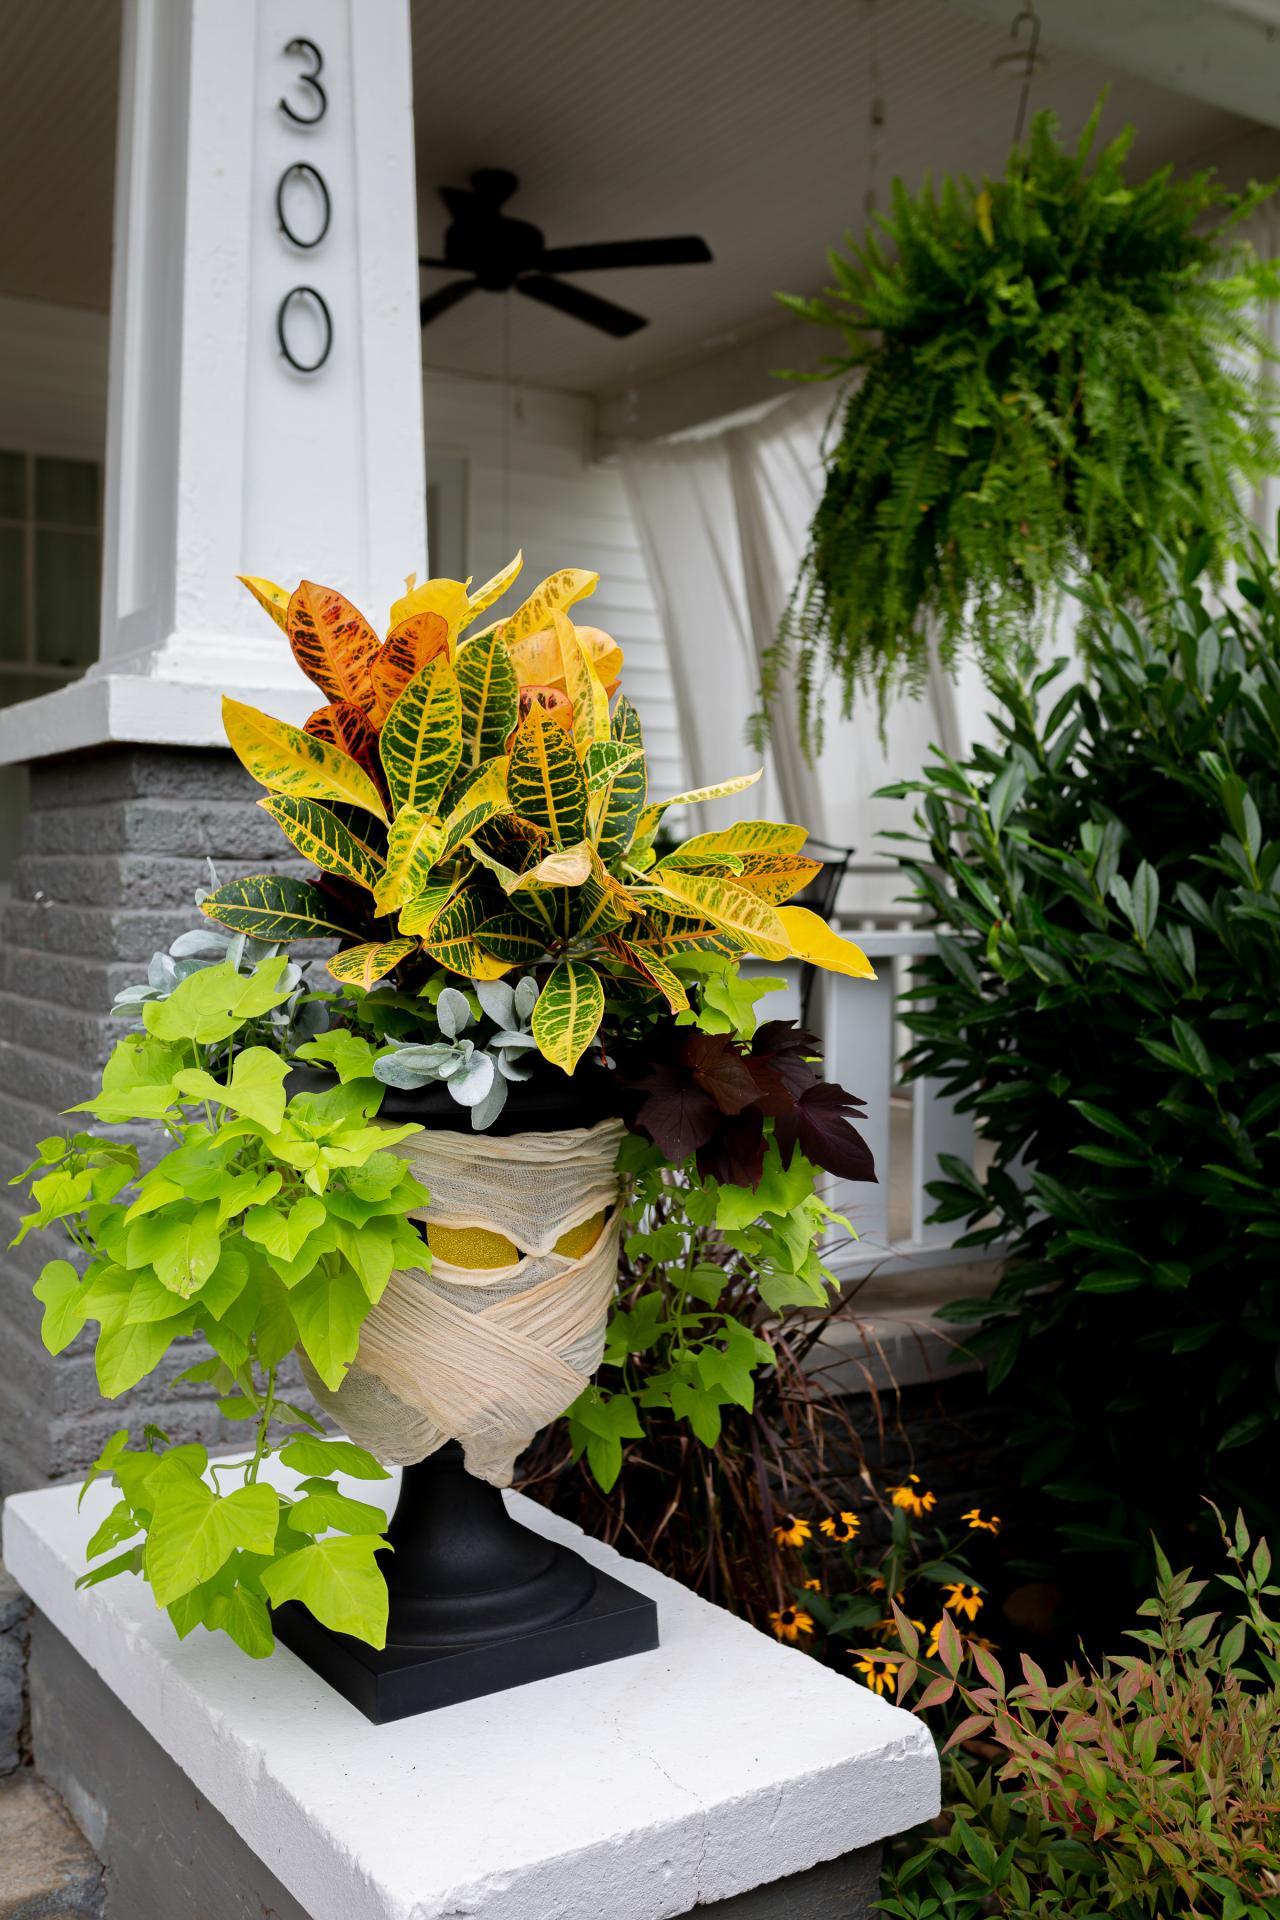 Mummify Your Garden as a Halloween Decoration Ideas